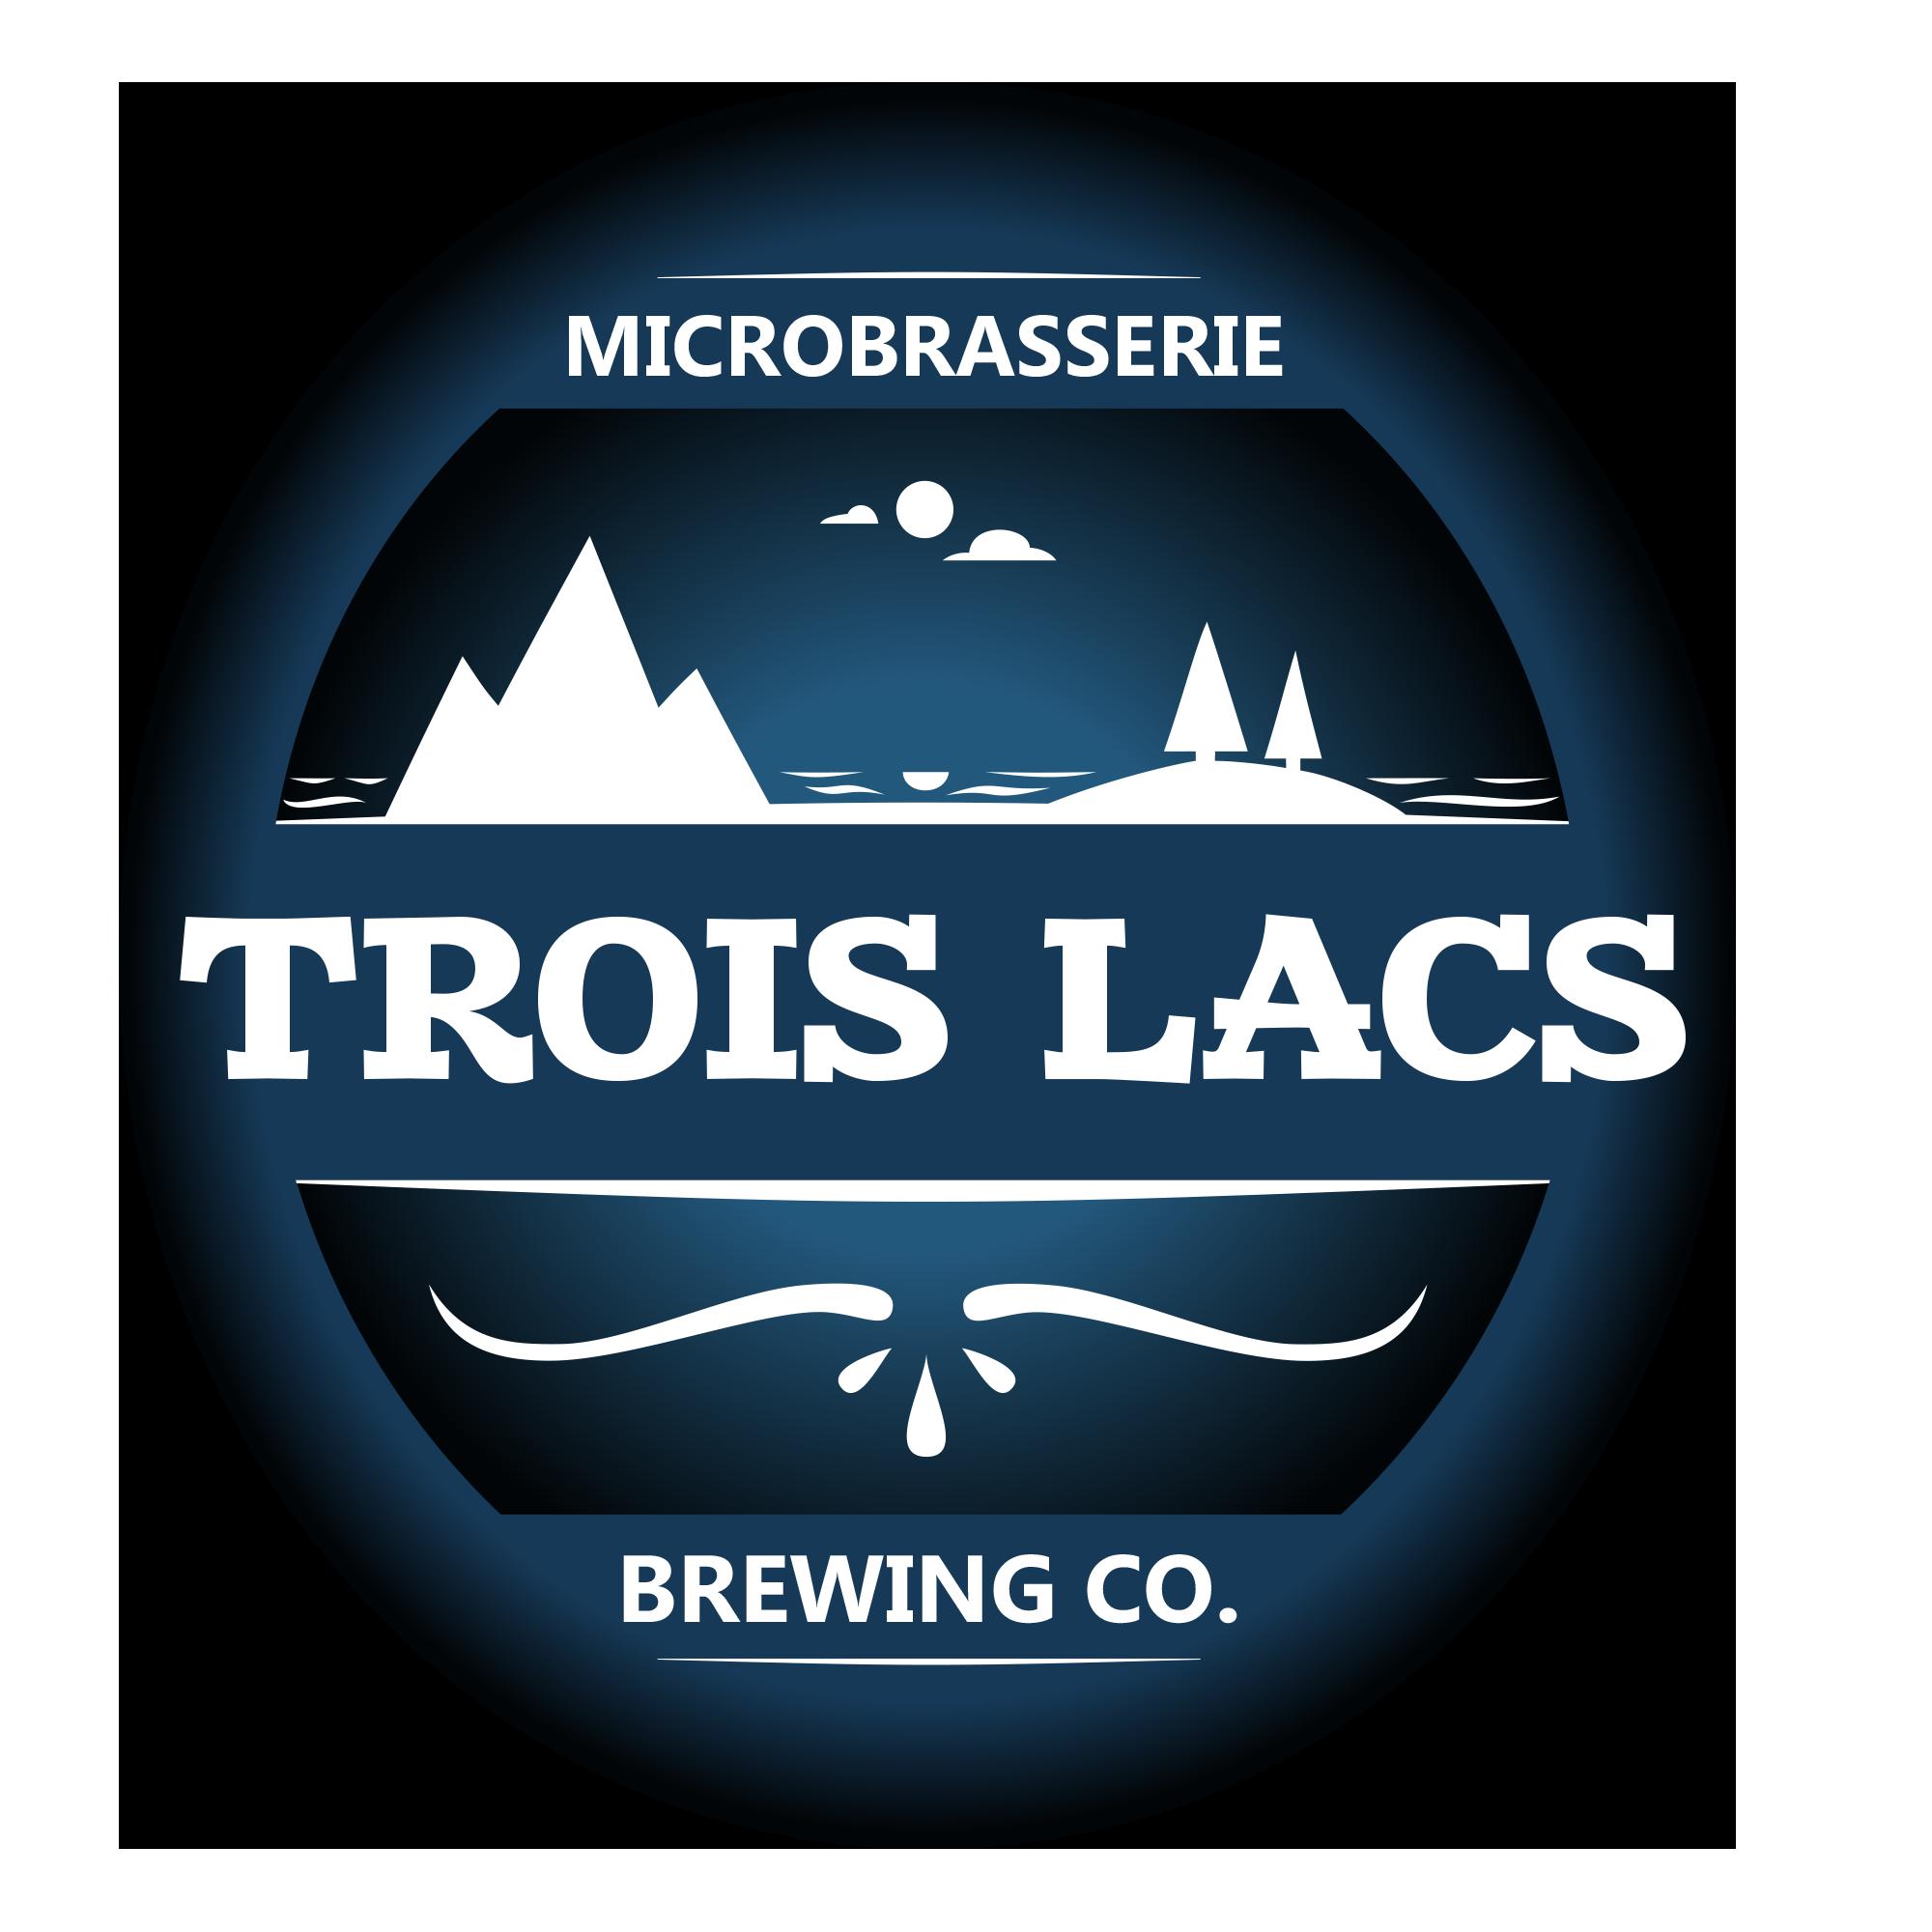 Microbrasserie Trois Lacs